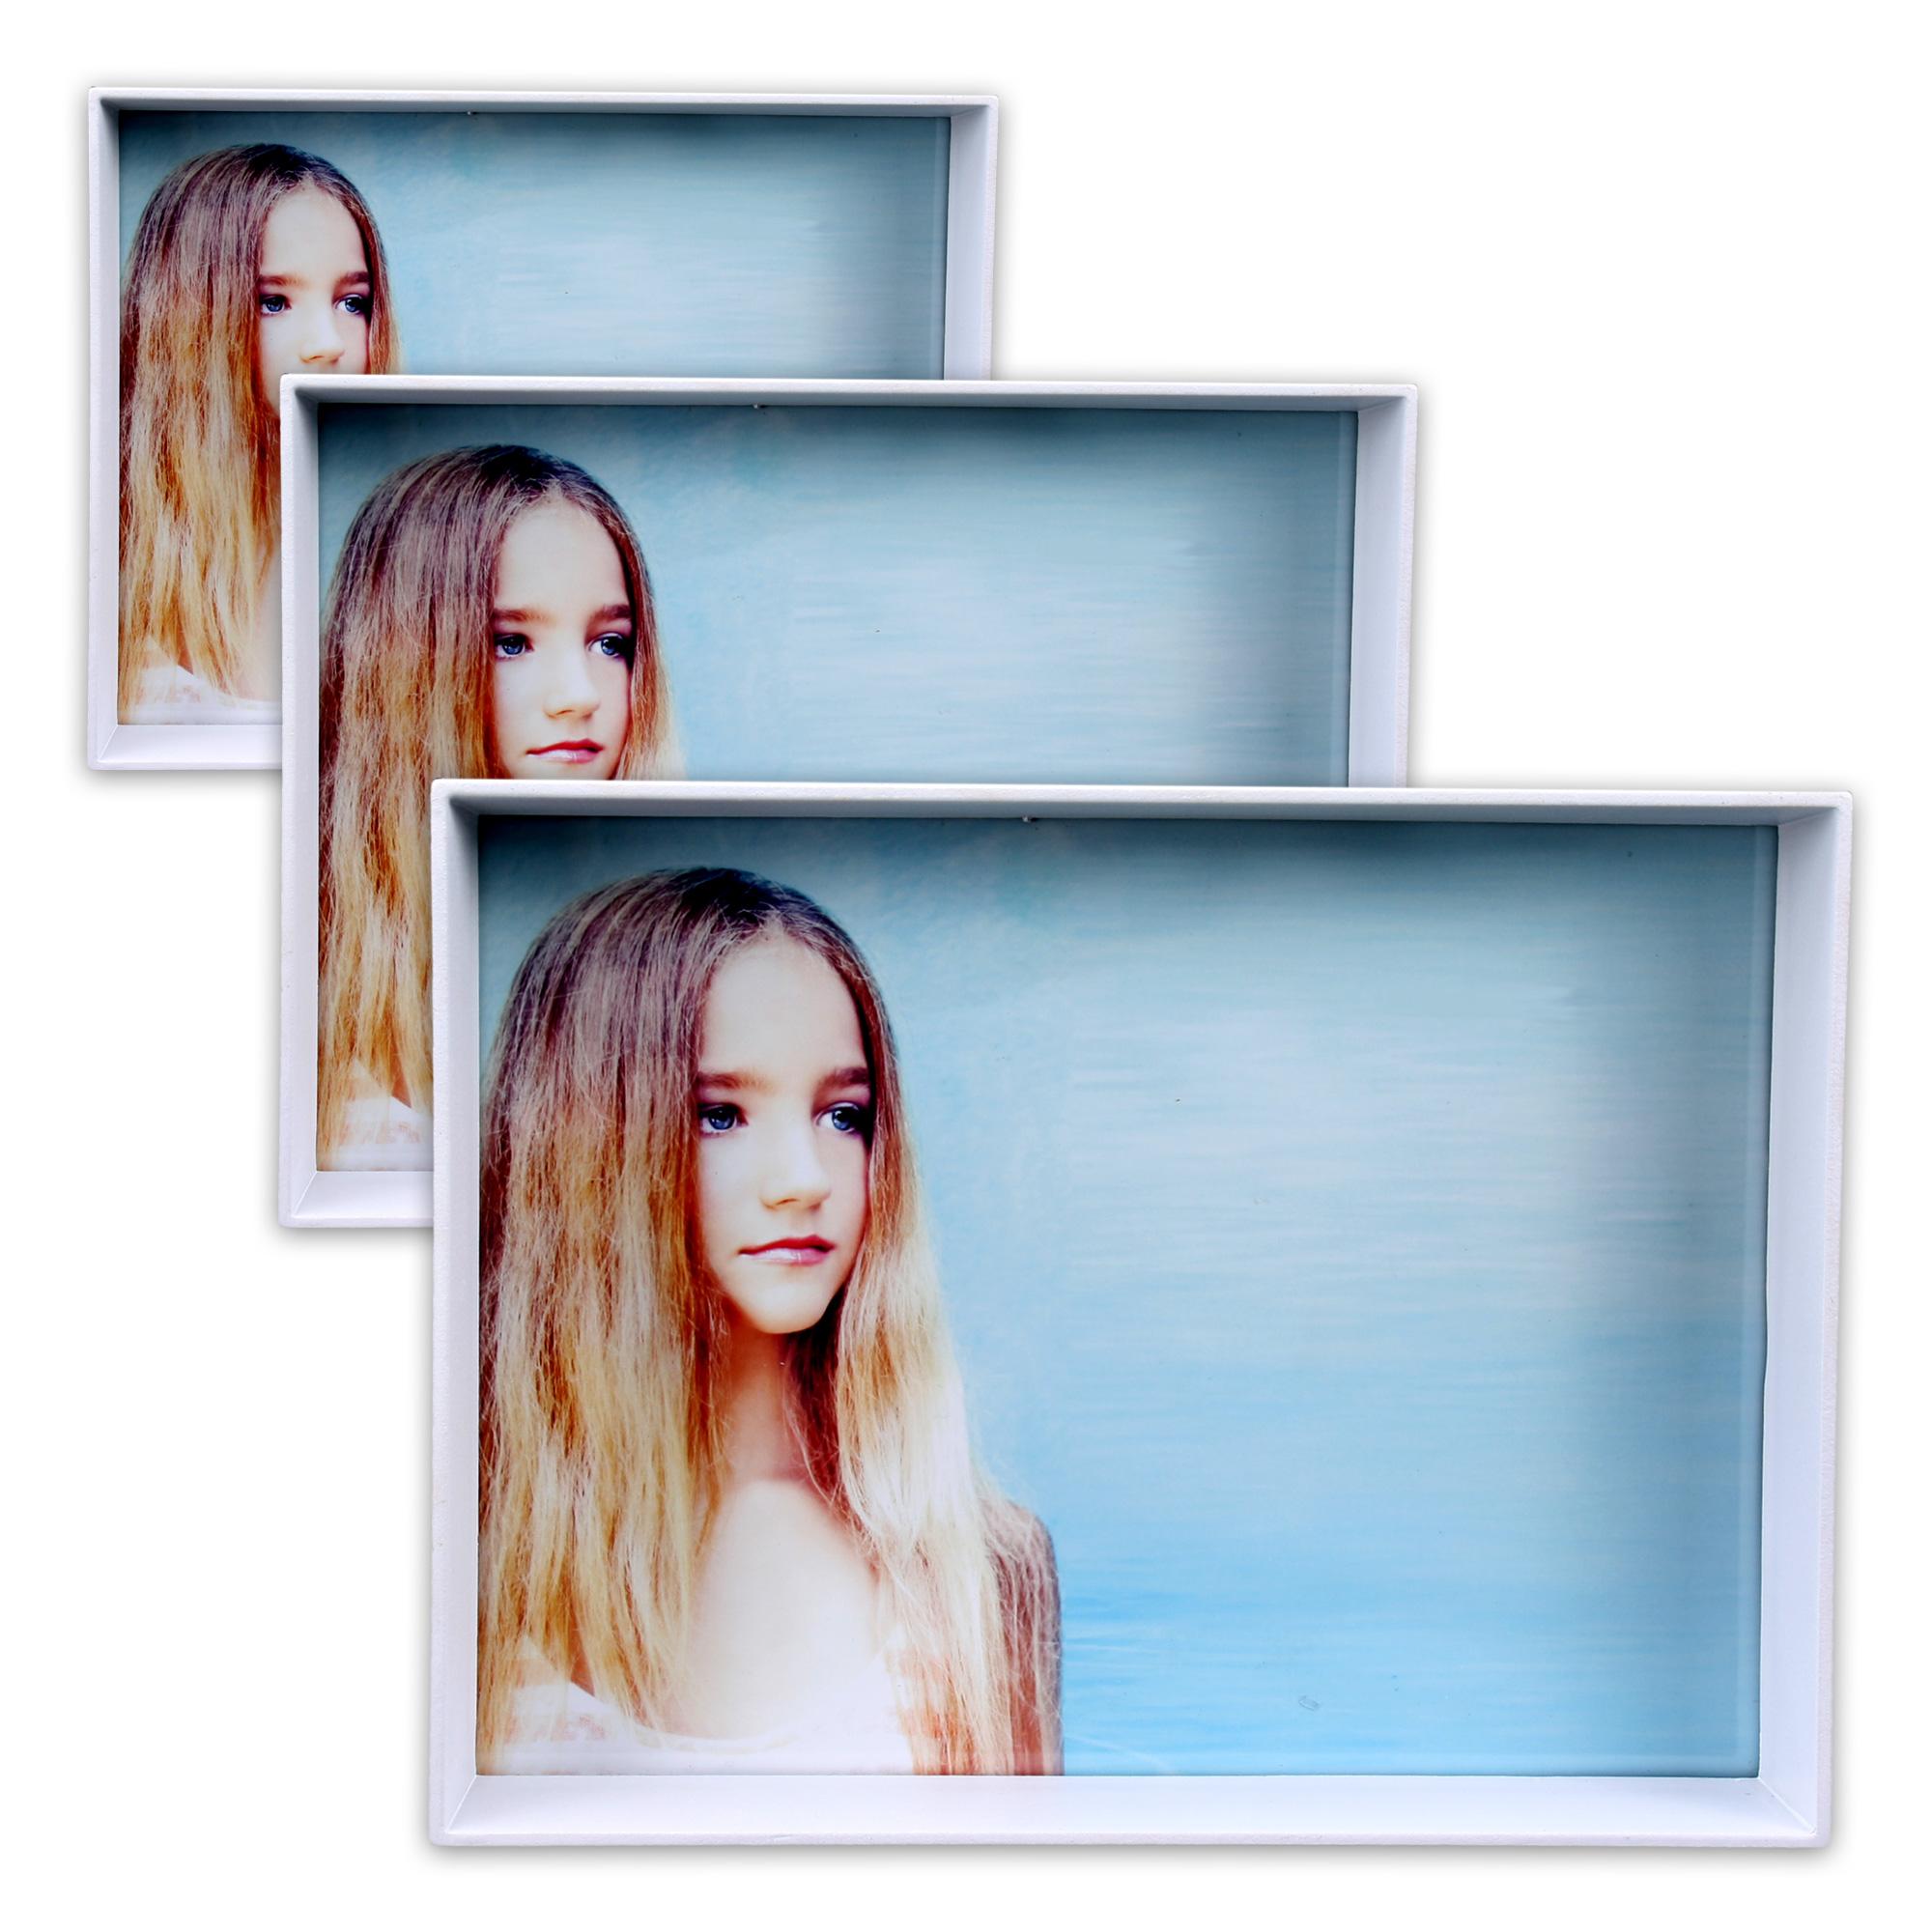 3 Bilderrahmen aus Kunststoff: 11 x 16 cm + 13,5 x 18,5 cm +